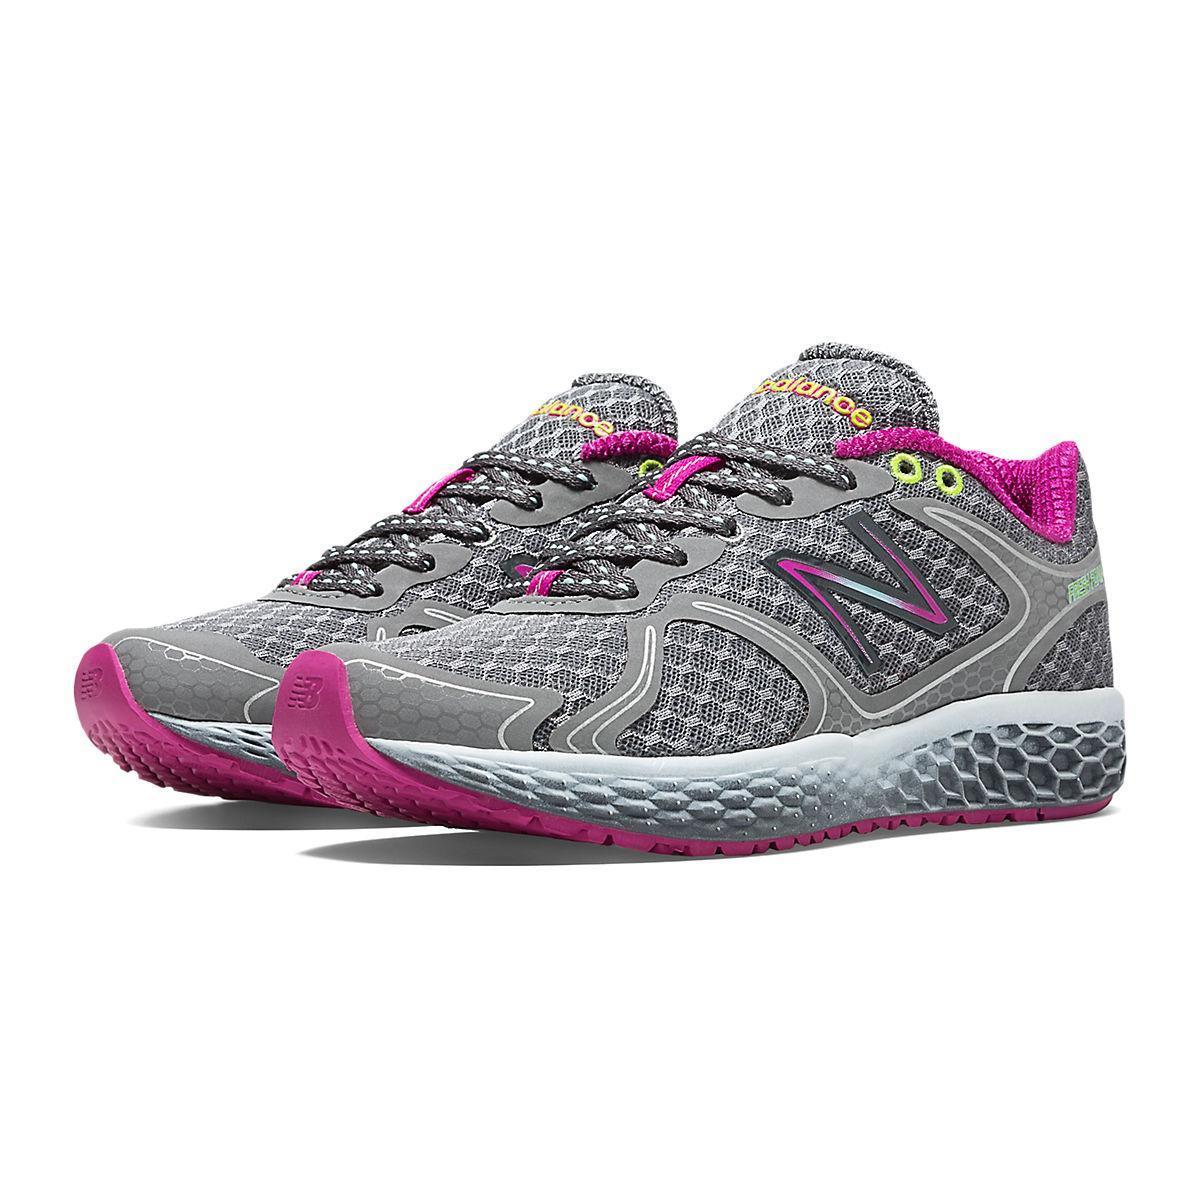 free shipping c3c84 f57b9 New Balance Fresh Foam 980 Womens (B) Running Shoes - Silver/Purple